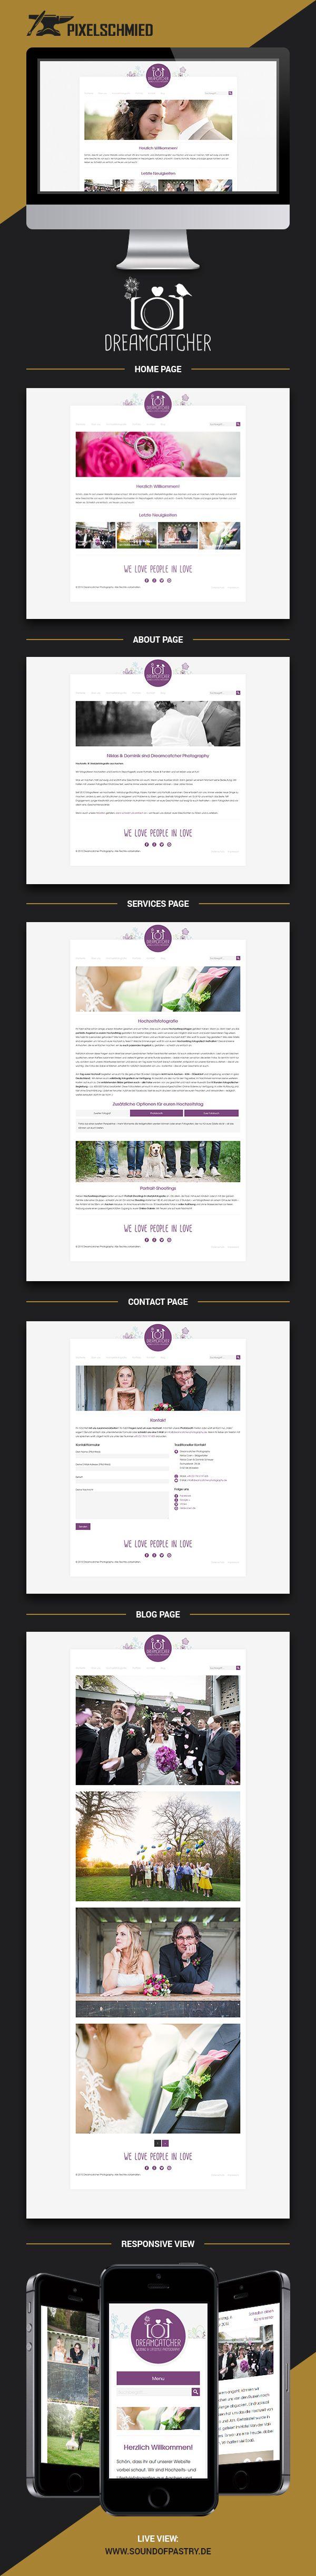 Web design & development for Dreamcatcher - Wedding & lifestyle photography from Aachen, Germany. 2014 #pixelschmied #webdesign #websitedesign #webdevelopment #website #wordpress #html5 #css3 #responsive #weddingphotography #weddingphotographer #dreamcatcher #aachen #designagency #designstudio